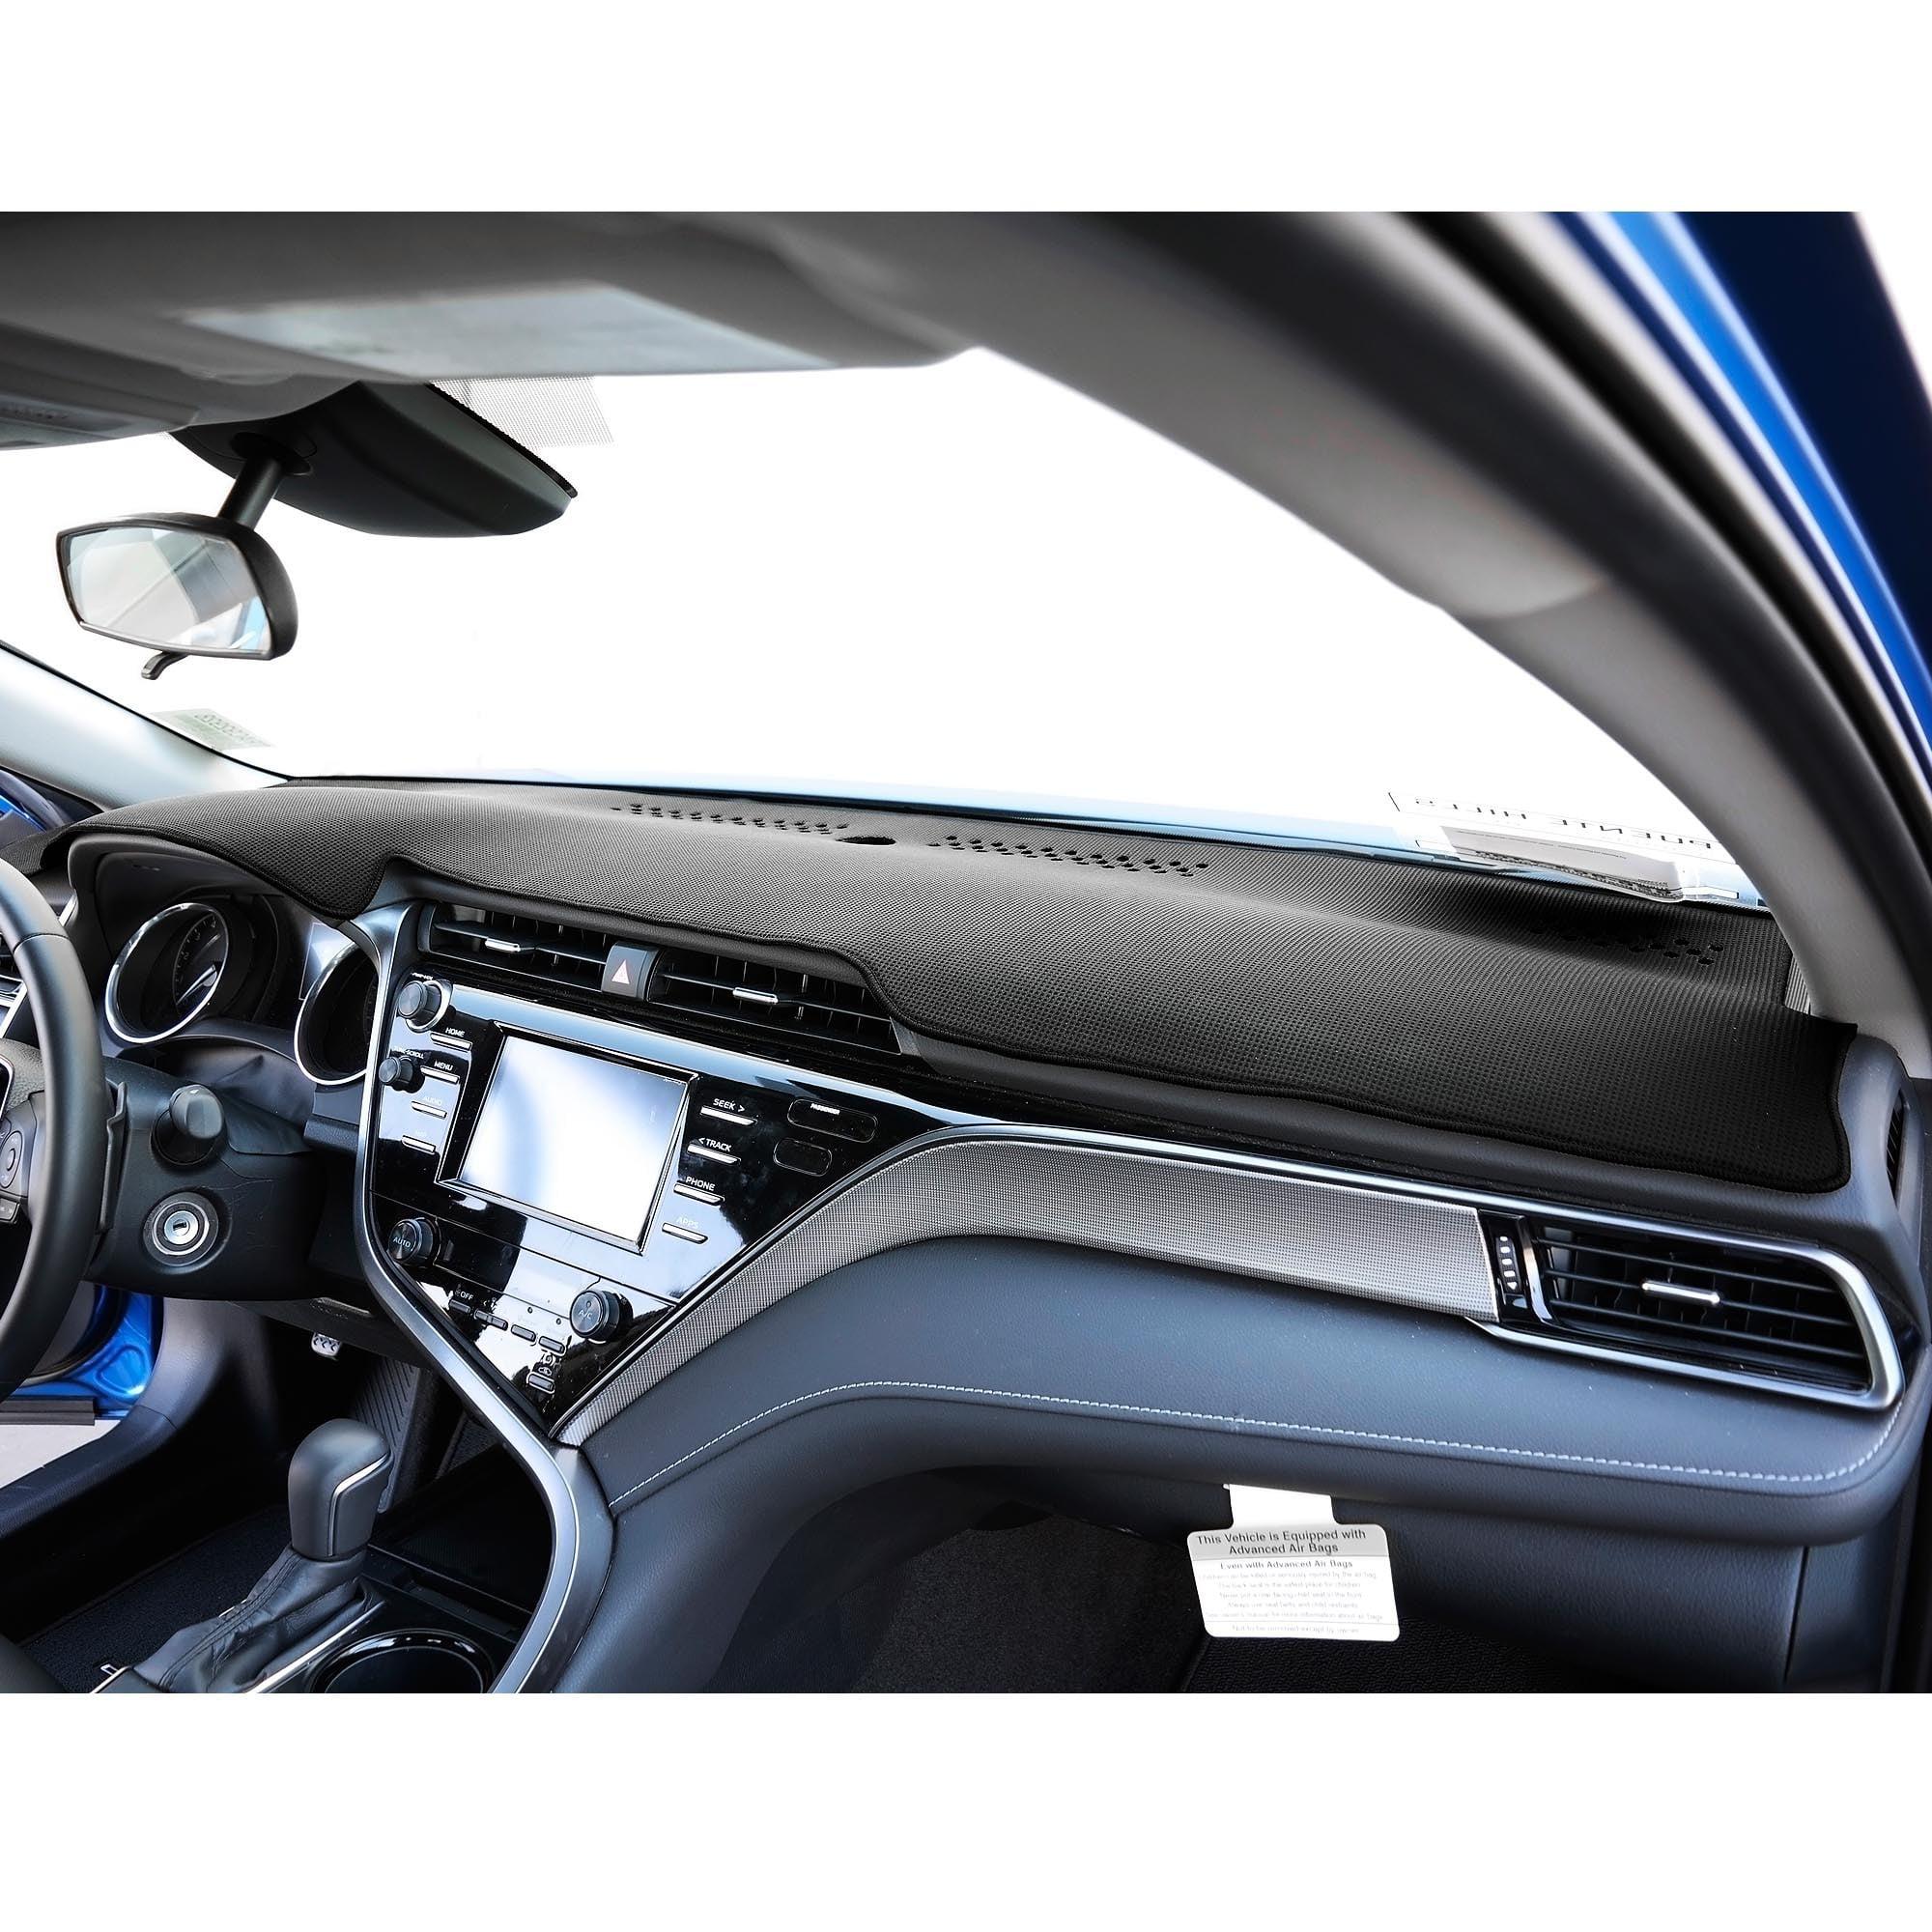 Black Dash Mat For Subaru 2002-2007 Impreza WellVisors Dashboard Cover